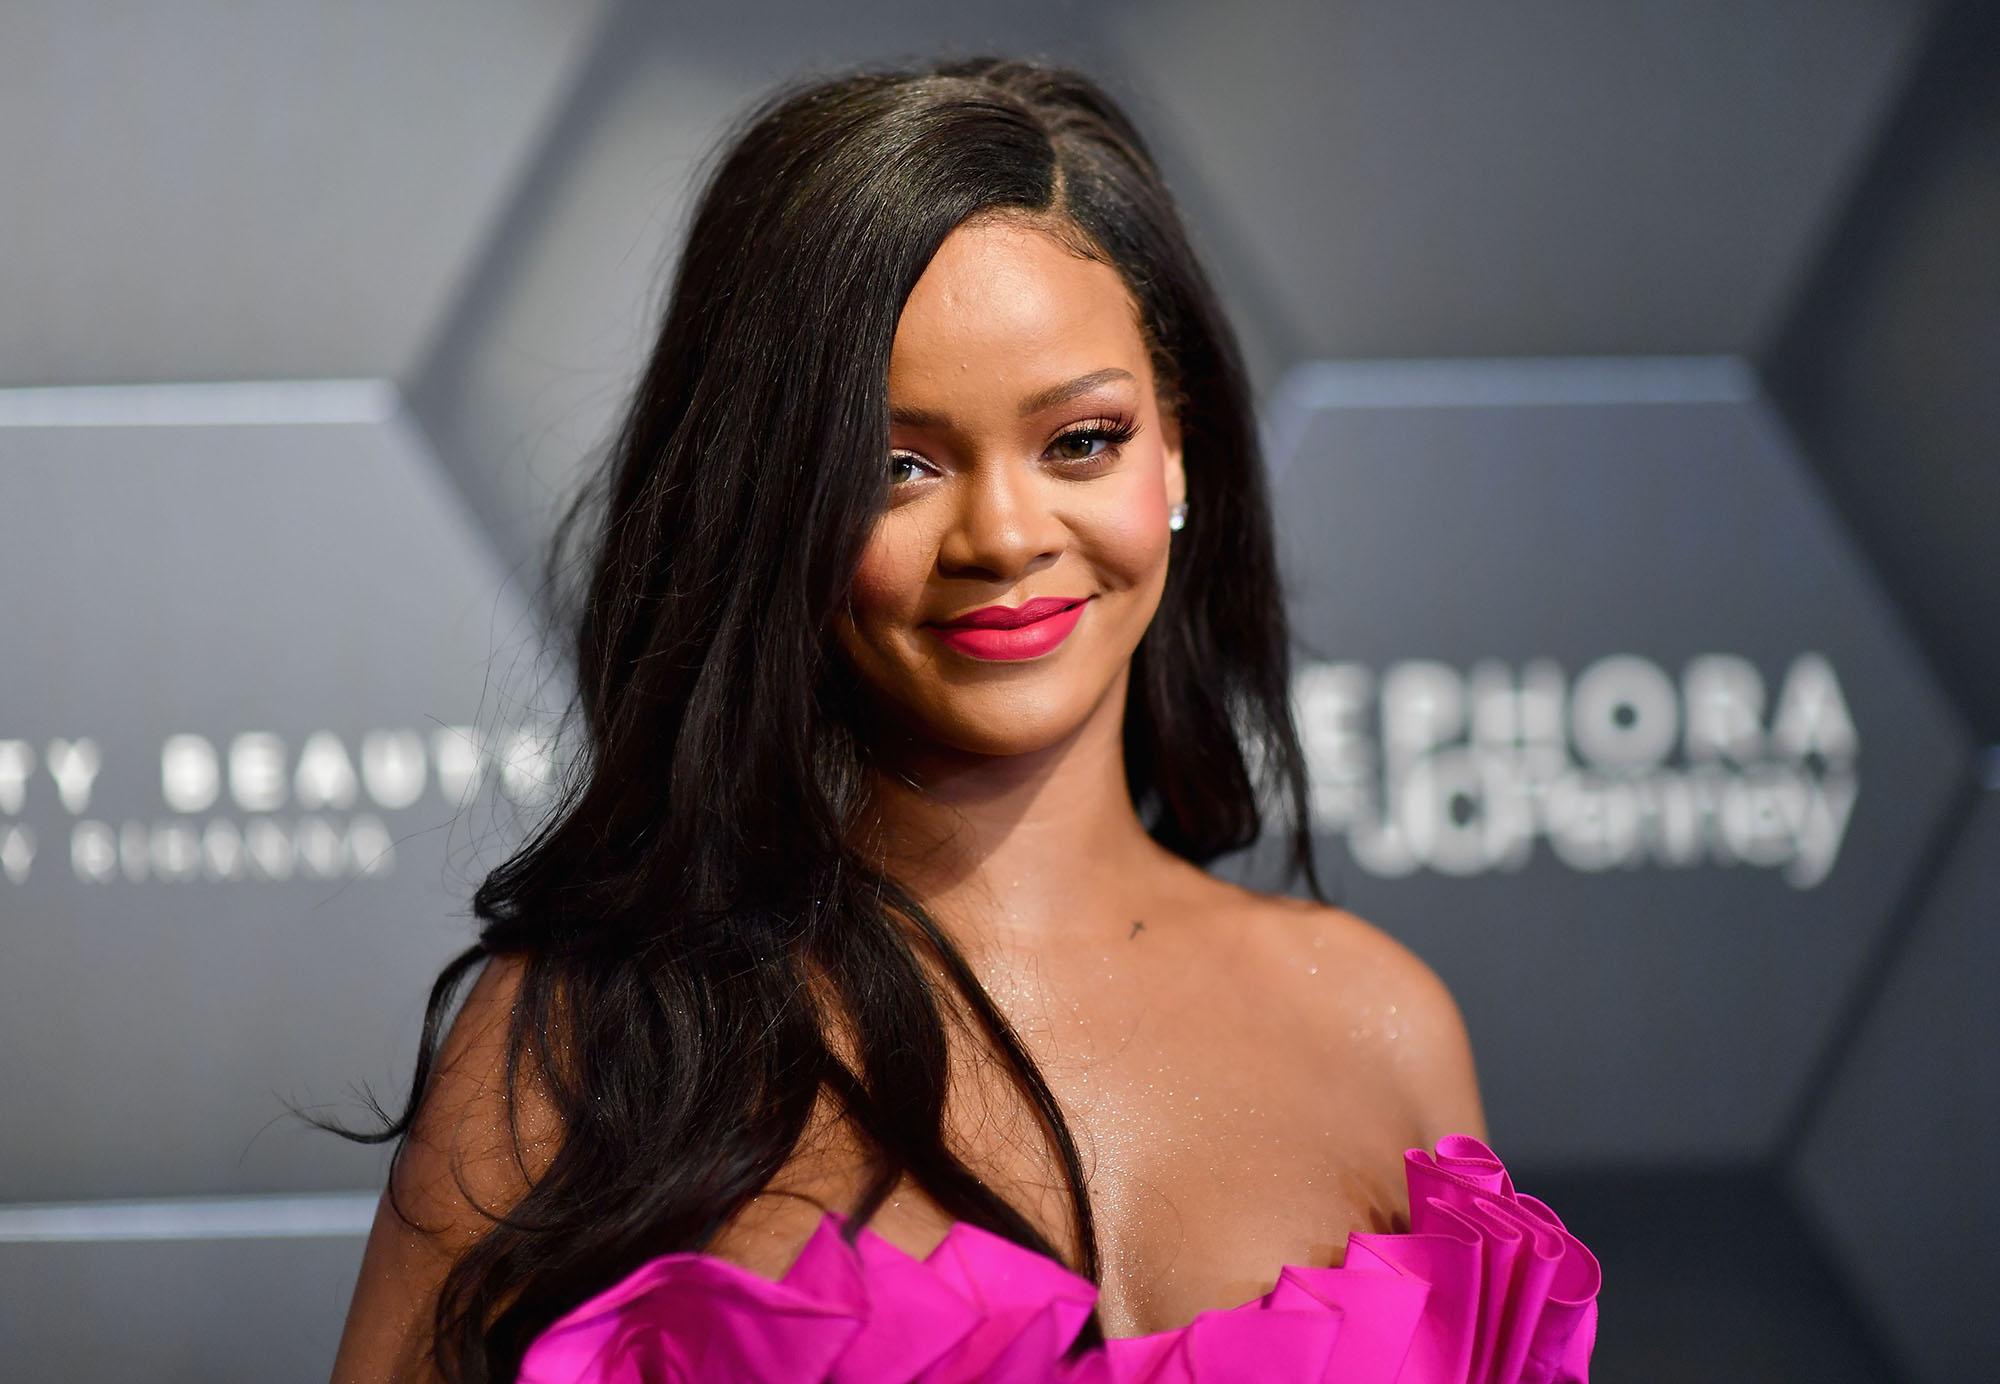 H Rihanna υιοθέτησε ήδη την πιο hot τάση στο μακιγιάζ τώρα